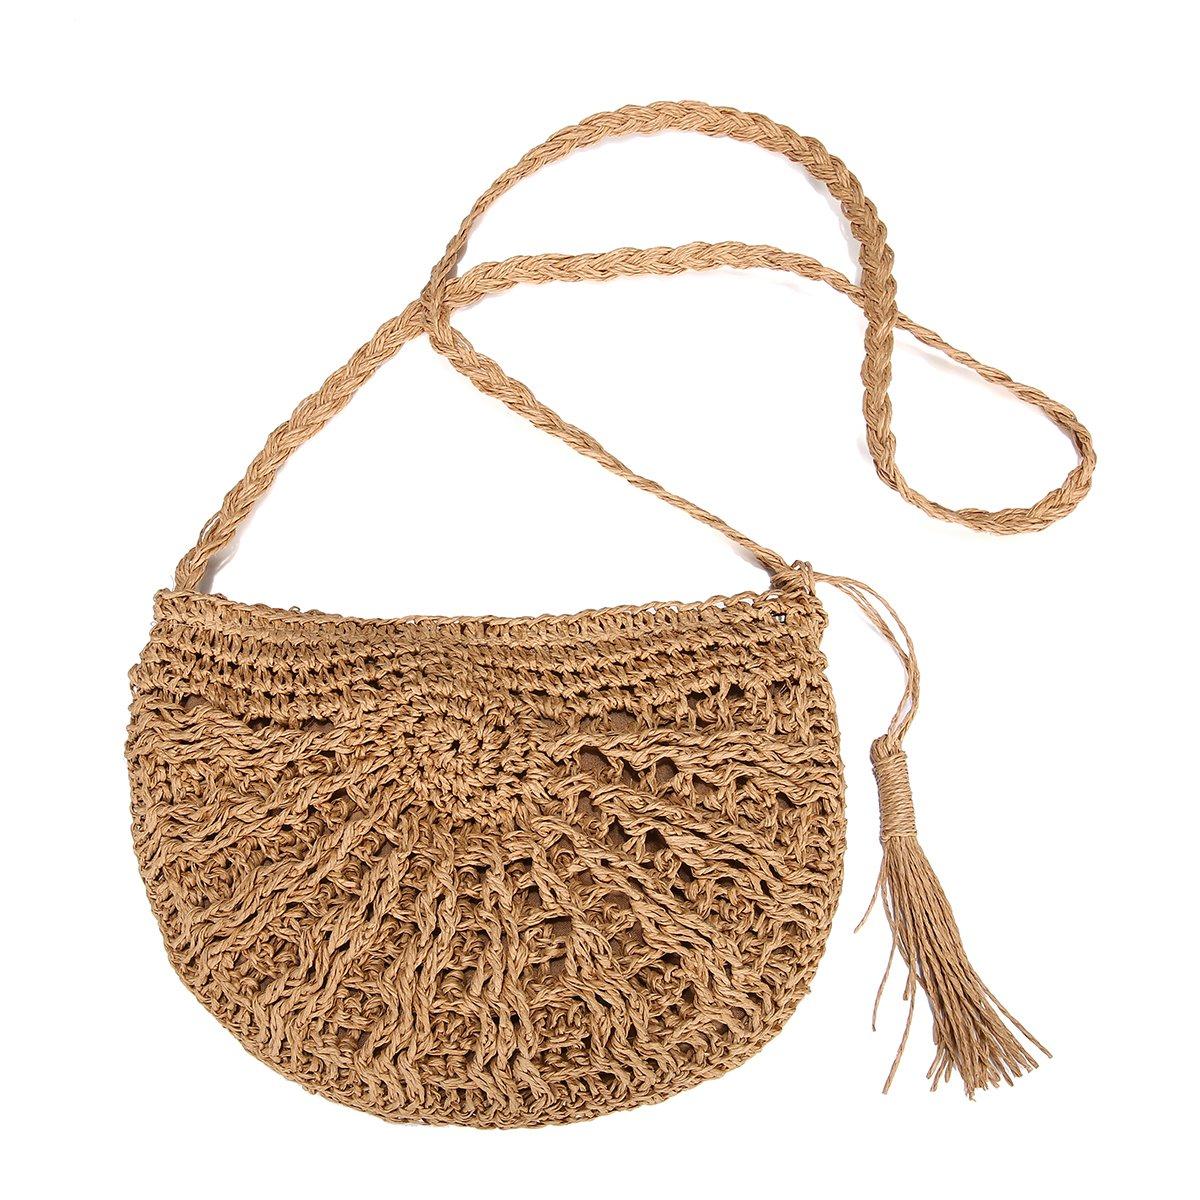 Straw Crossbody Bag, JOSEKO Women Weave Shoulder Bag Summer Beach Purse for Travel Everyday Use JOSEKO Women Weave Shoulder Bag Summer Beach Purse for Travel Everyday Use Khaki 28 x 15 x 26cm(L x W x H) JOSEKOUSRnal1552